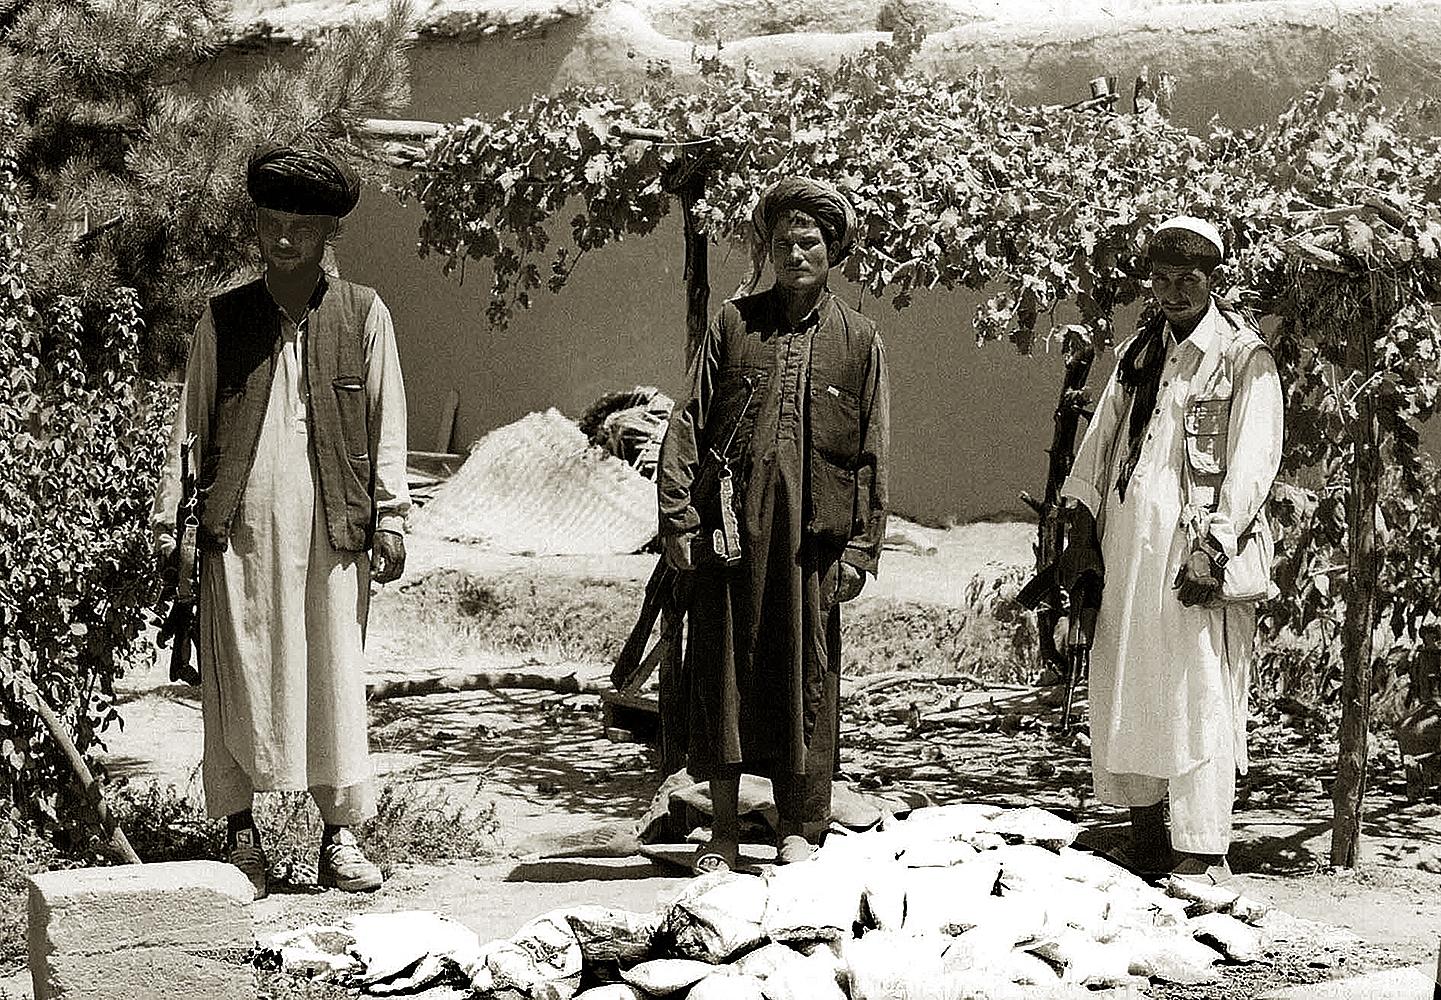 Пограничники Исламского государства Афганистан с конфискованным грузом героина. Провинция Тахар, август 1999 года. Фото А.А. Князева